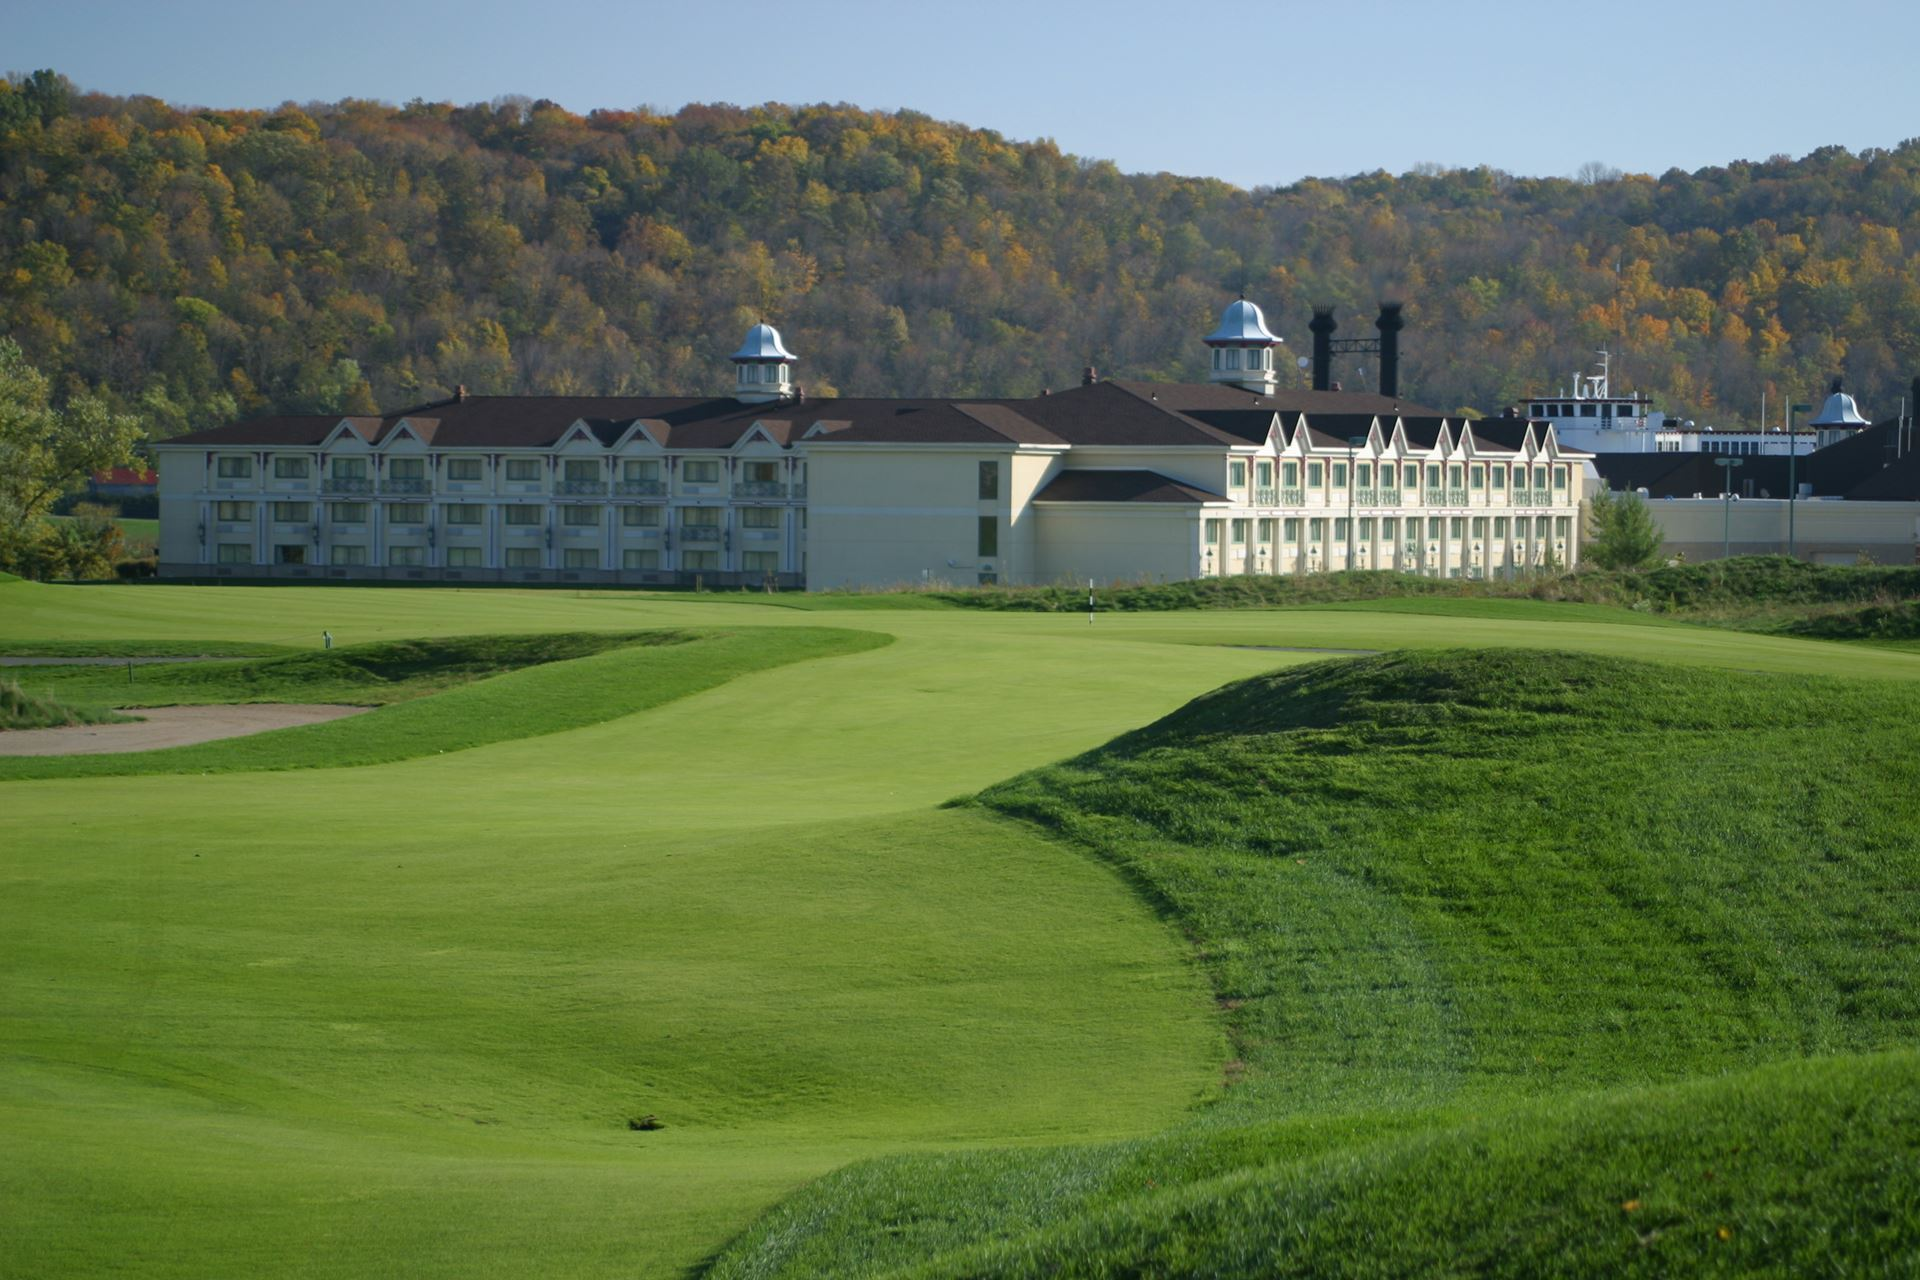 Rising Star Casino & Resort RV Park - golf course